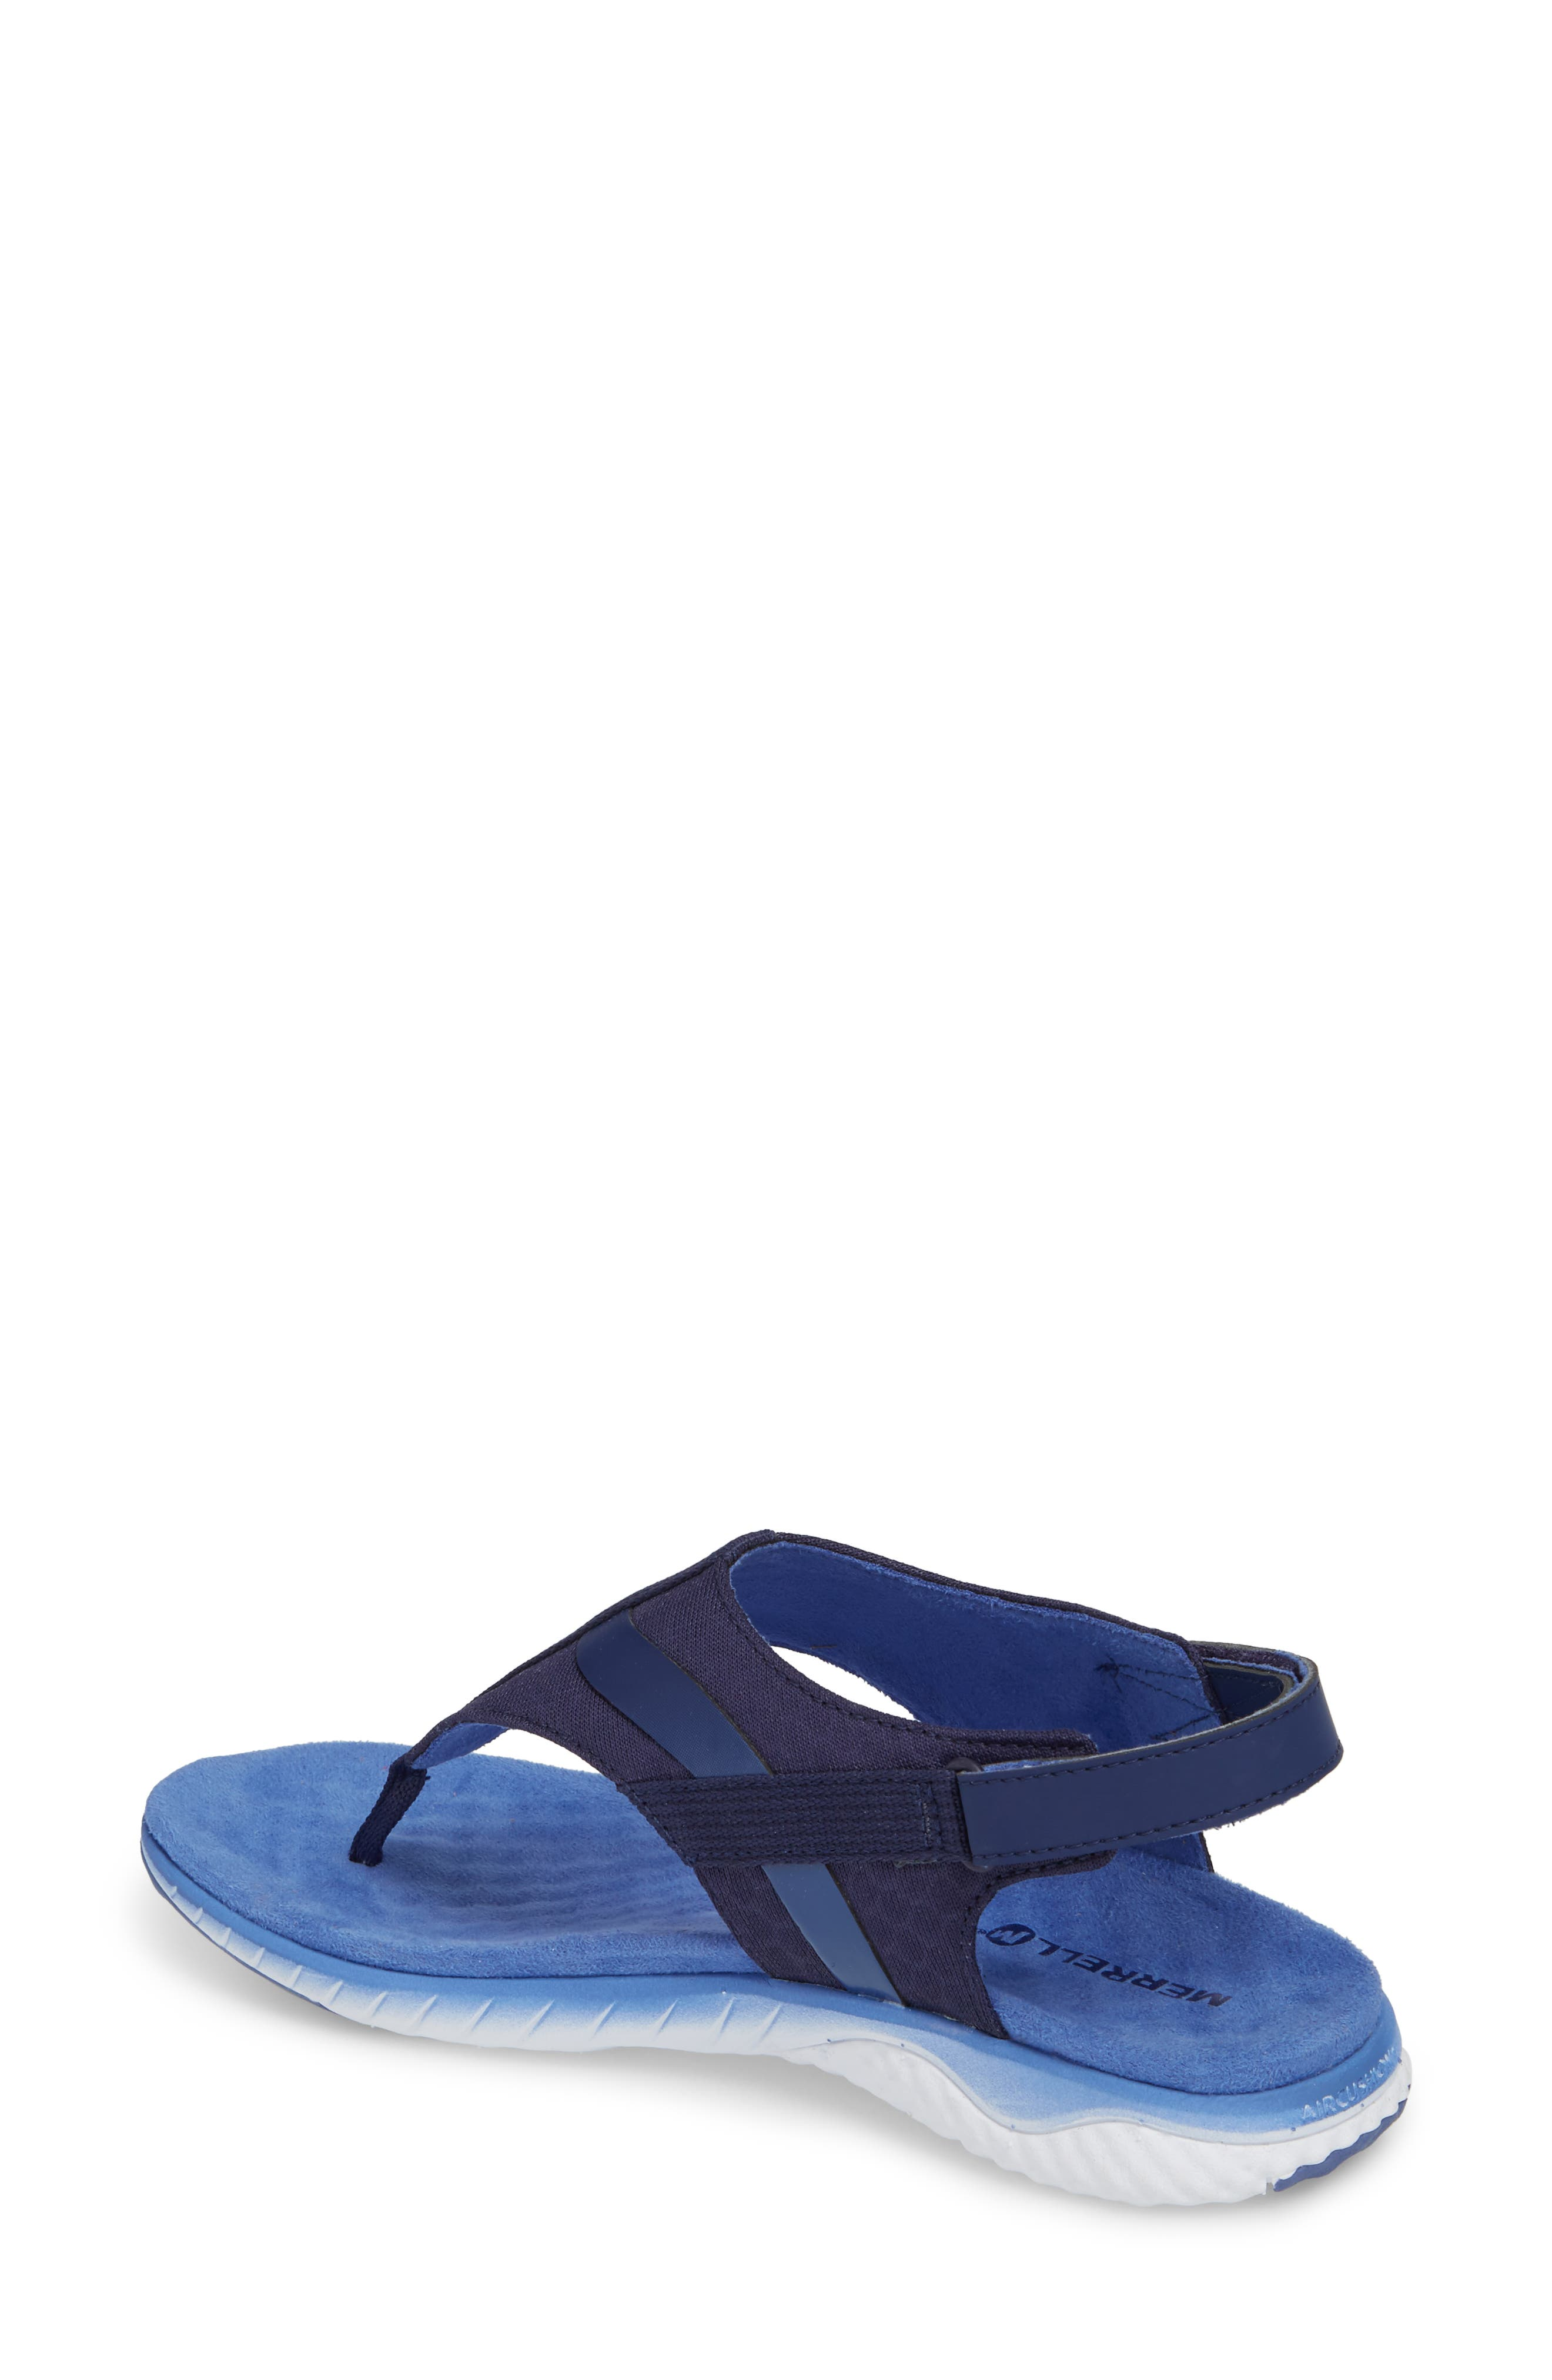 1SIX8 Linna Slide Air Cushion+ Sandal,                             Alternate thumbnail 7, color,